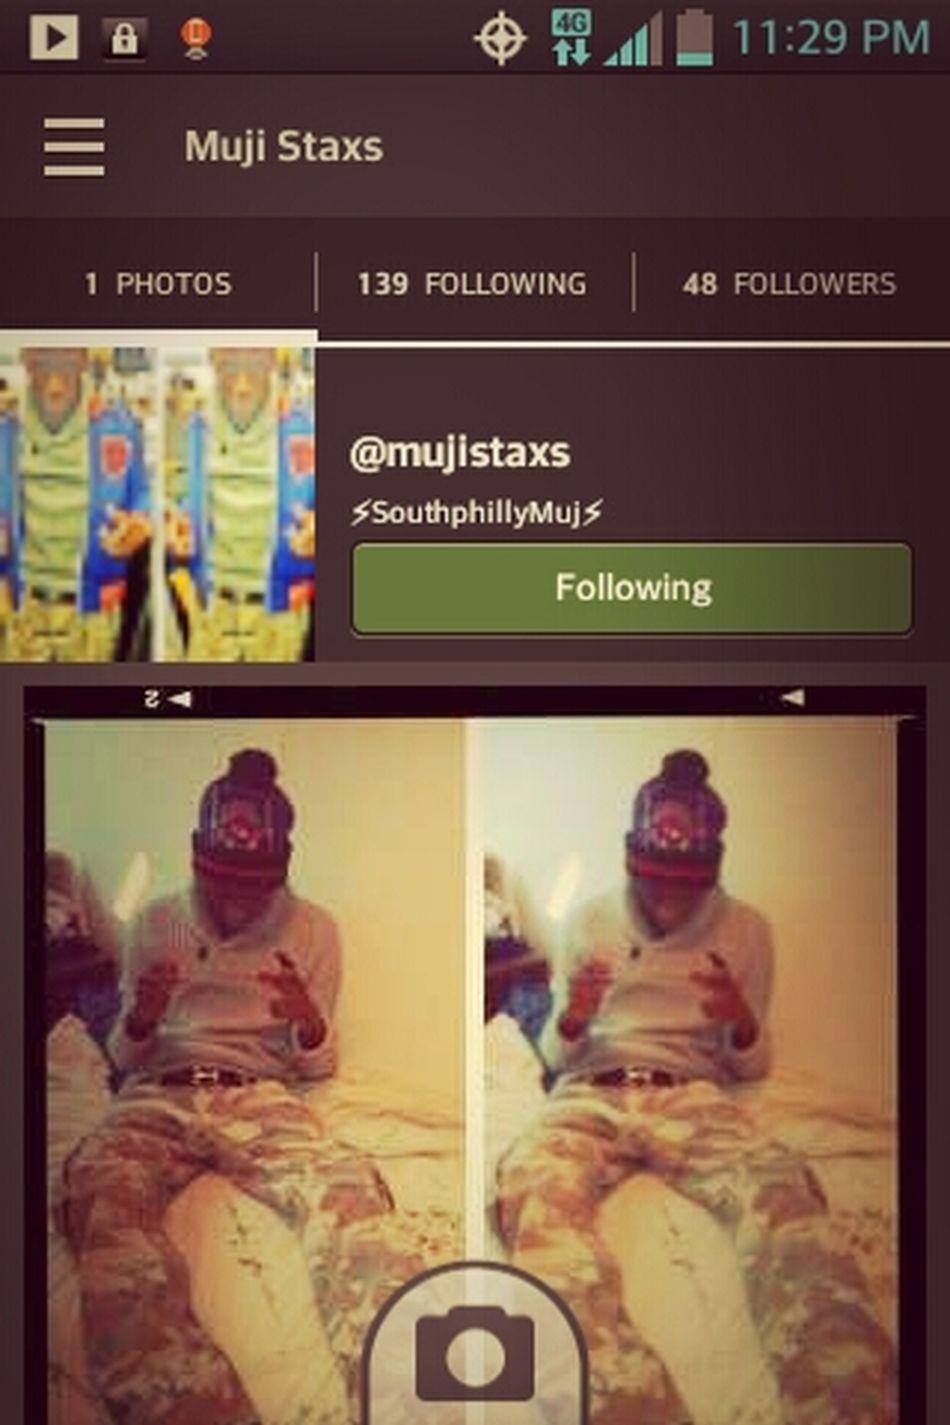 Yoo Everybody Goo Follow My Manz @mujistaxs He A Good Look '